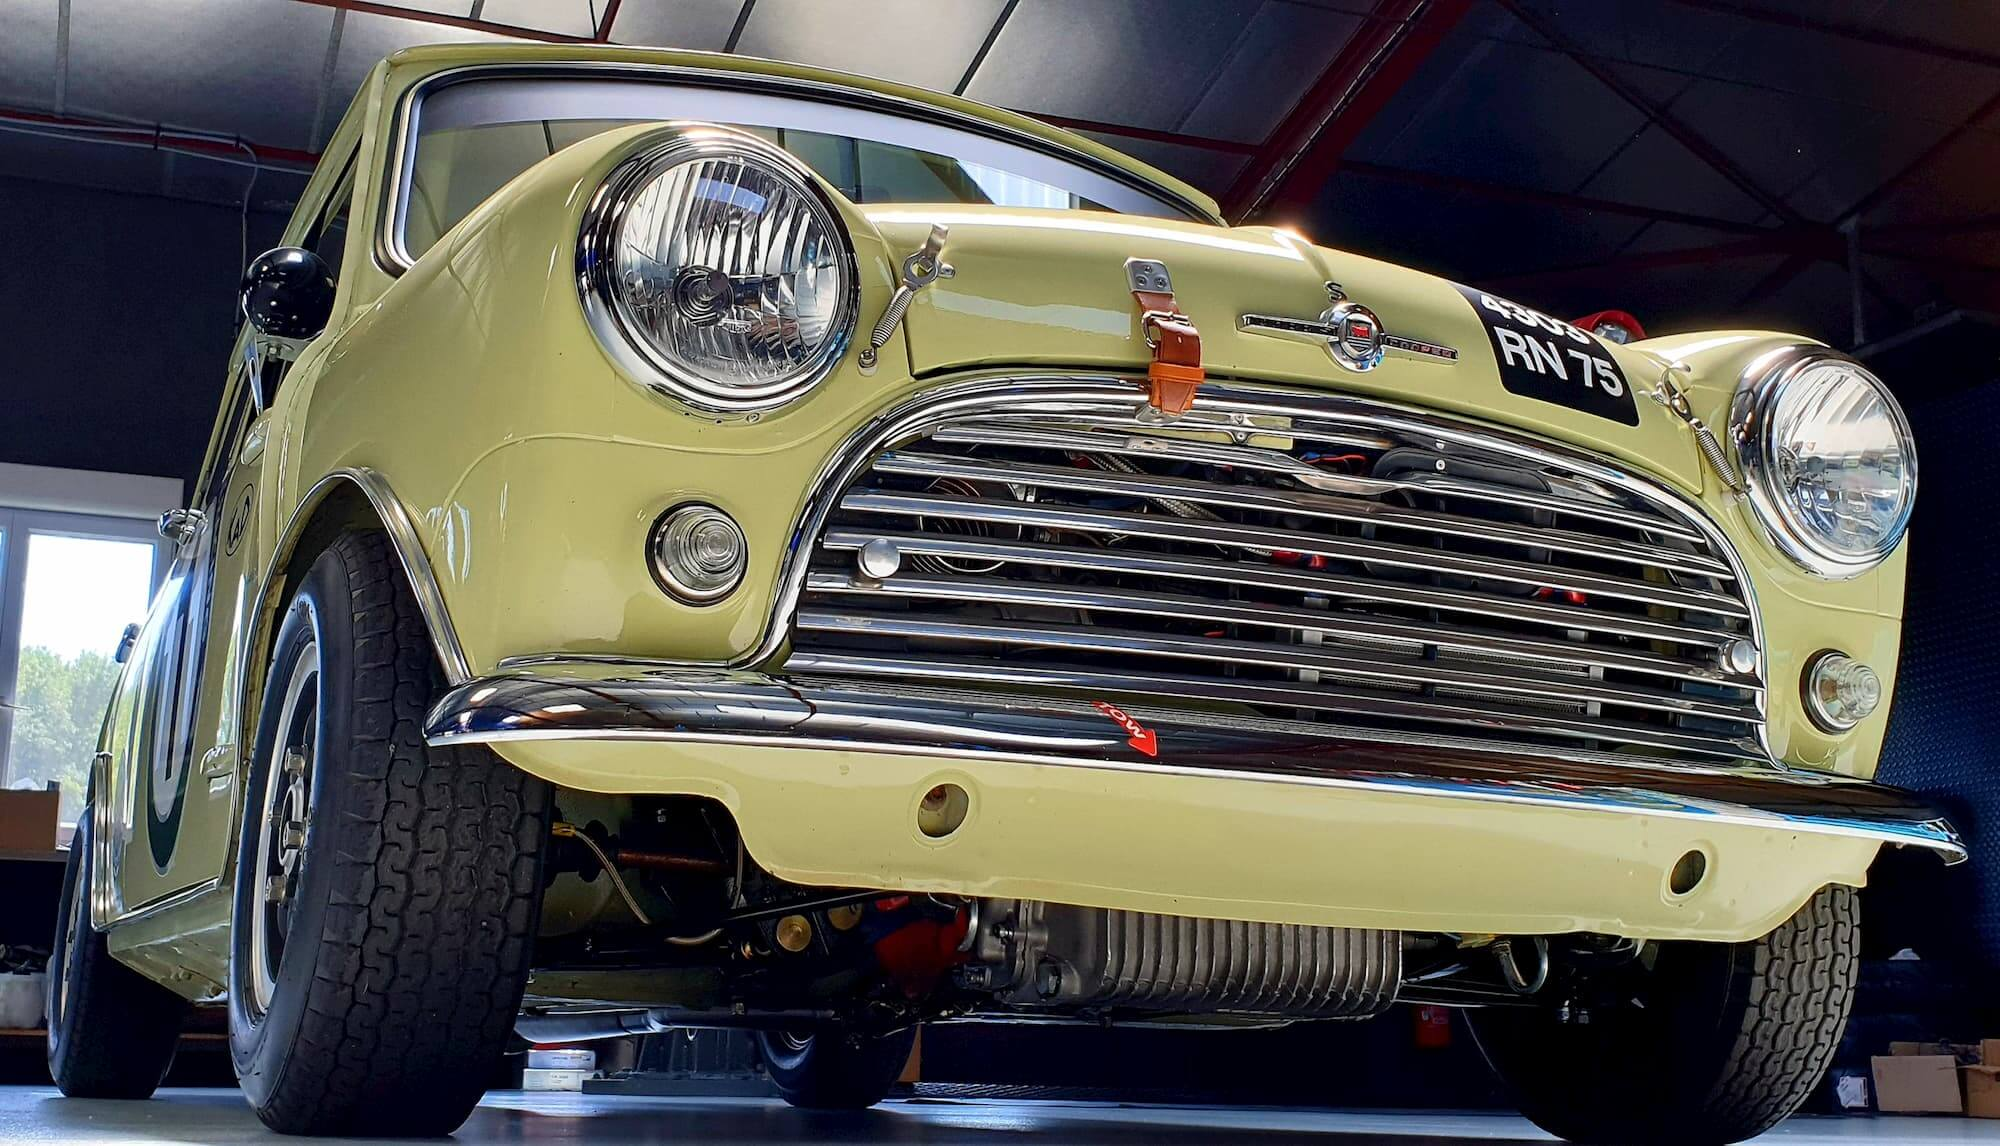 Austin Mini Cooper S, born to win - Historic Tour - british racing car